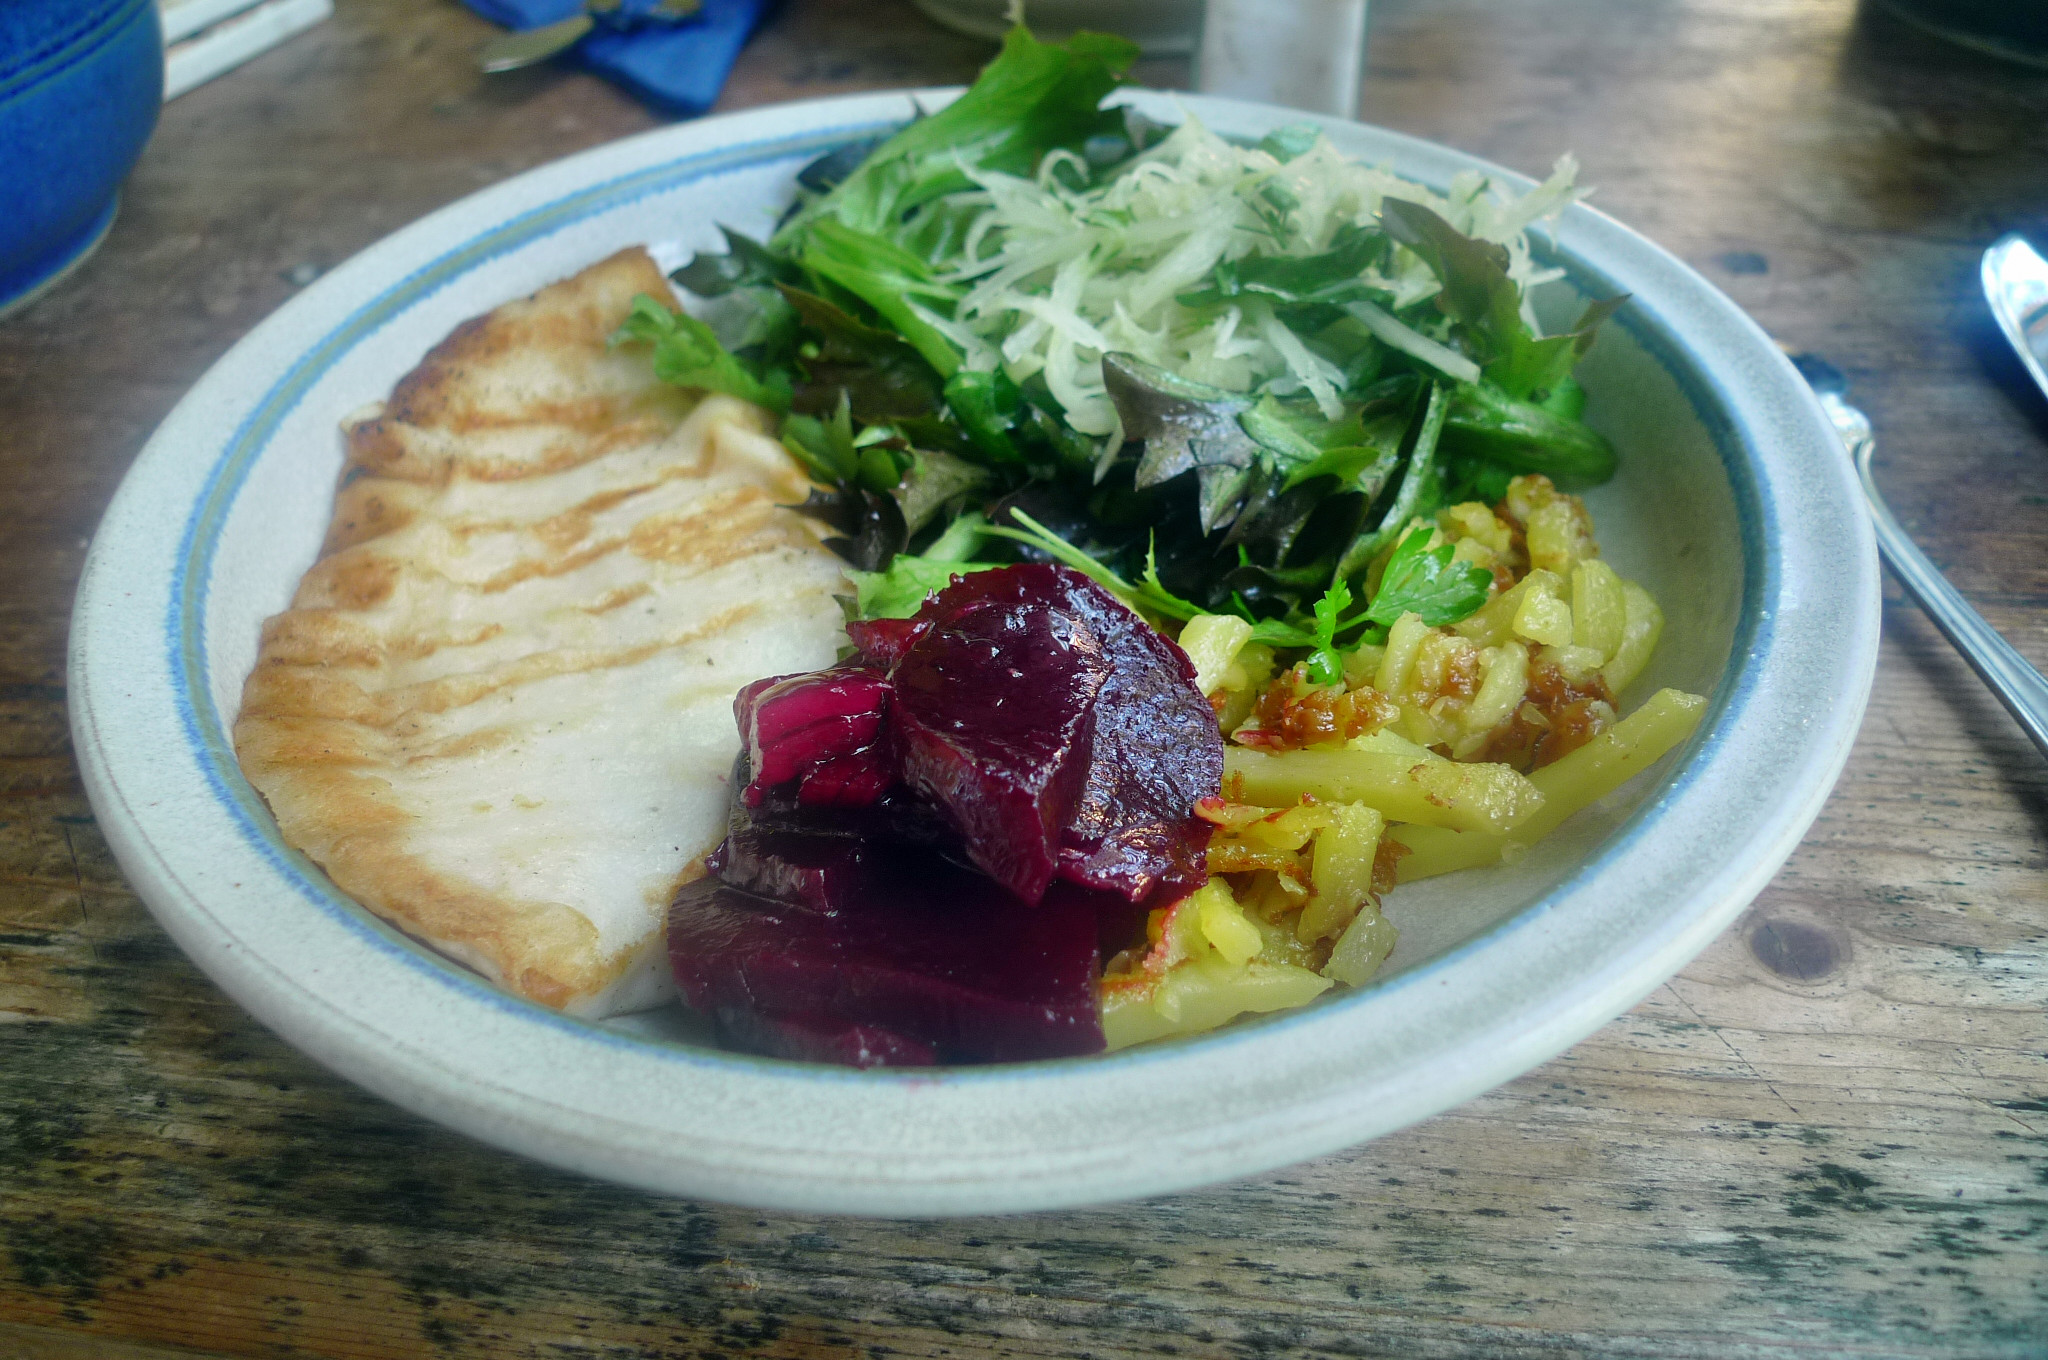 Scholle,Kartoffeln,Salate - 17.9.14   (16)